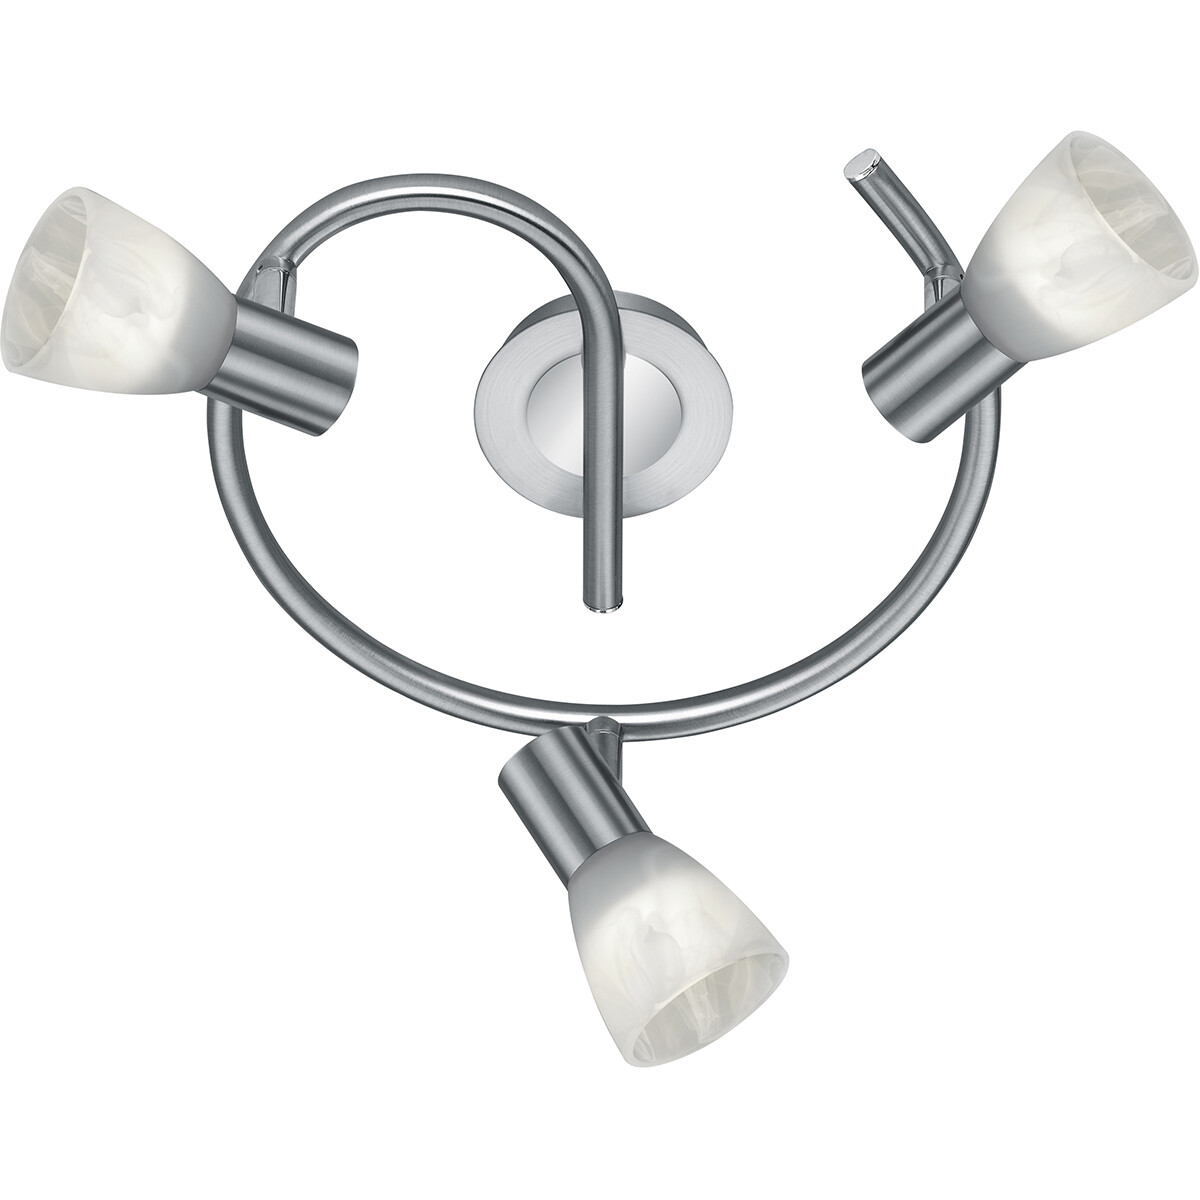 LED Plafondspot - Trion Levino - E14 Fitting - Warm Wit 3000K - 3-lichts - Rond - Mat Nikkel - Alumi